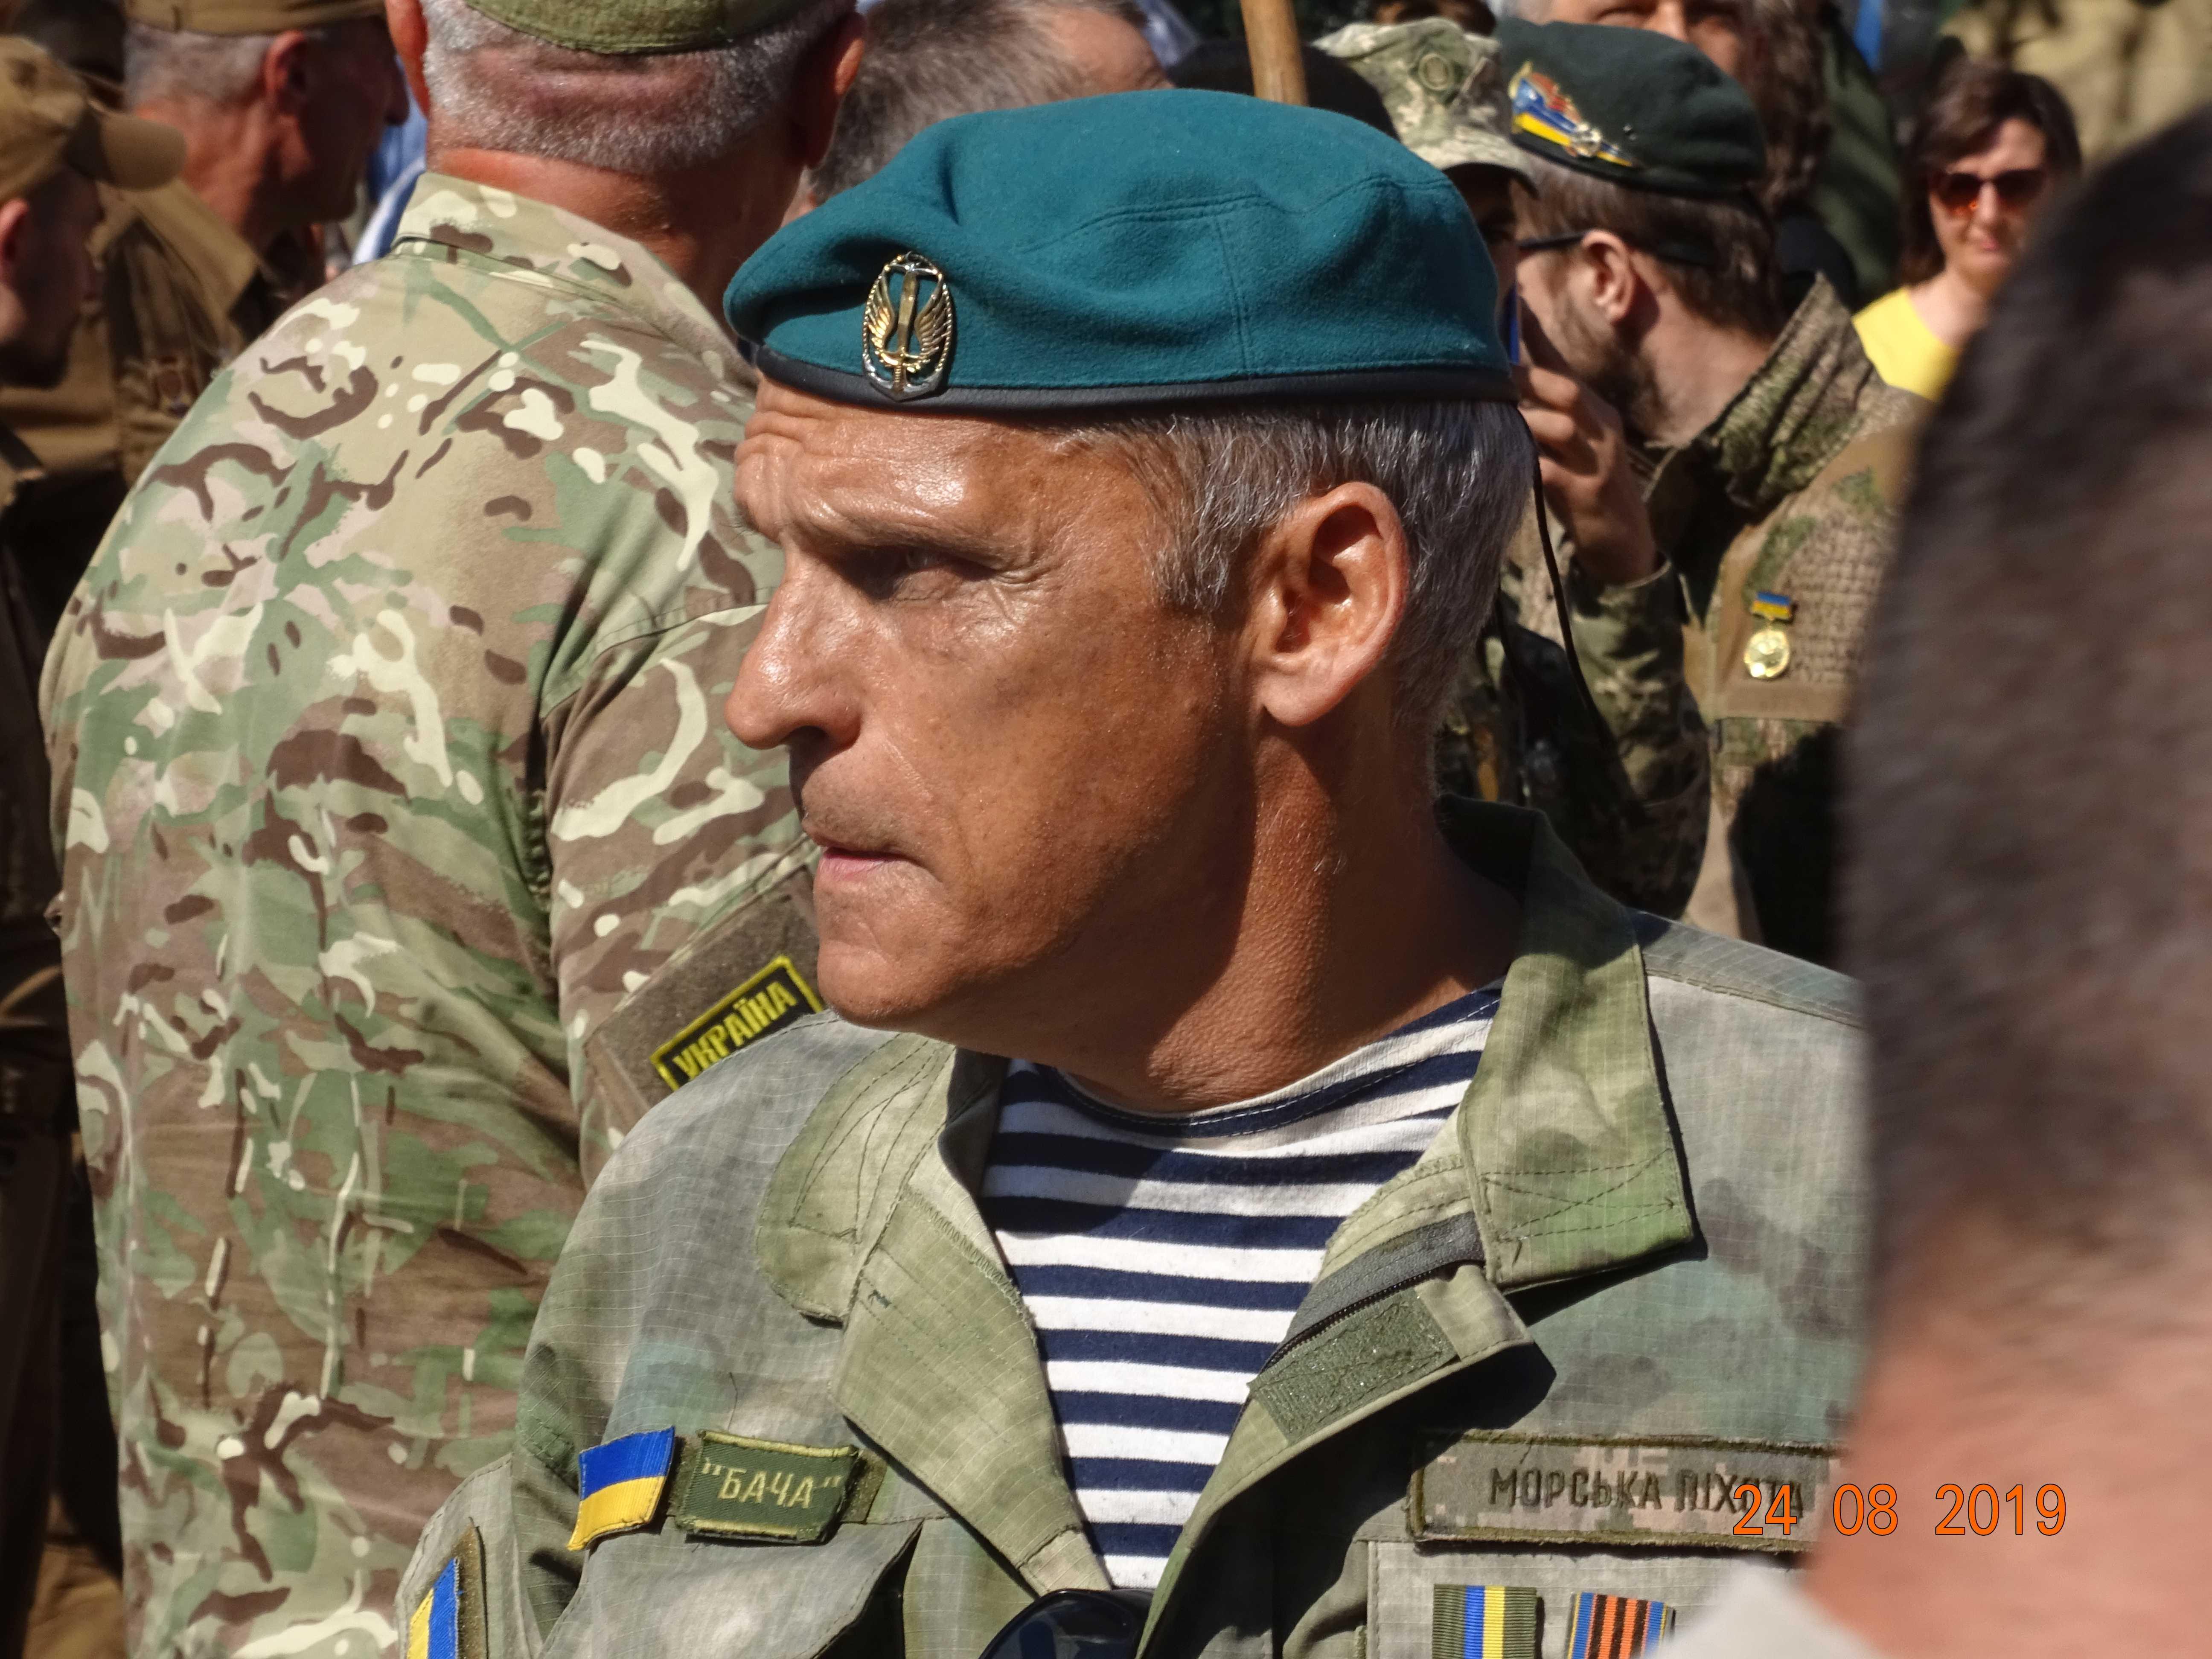 Defenders-of-Ukraine-Parad-24.Aug.19 - DSC05973.jpg